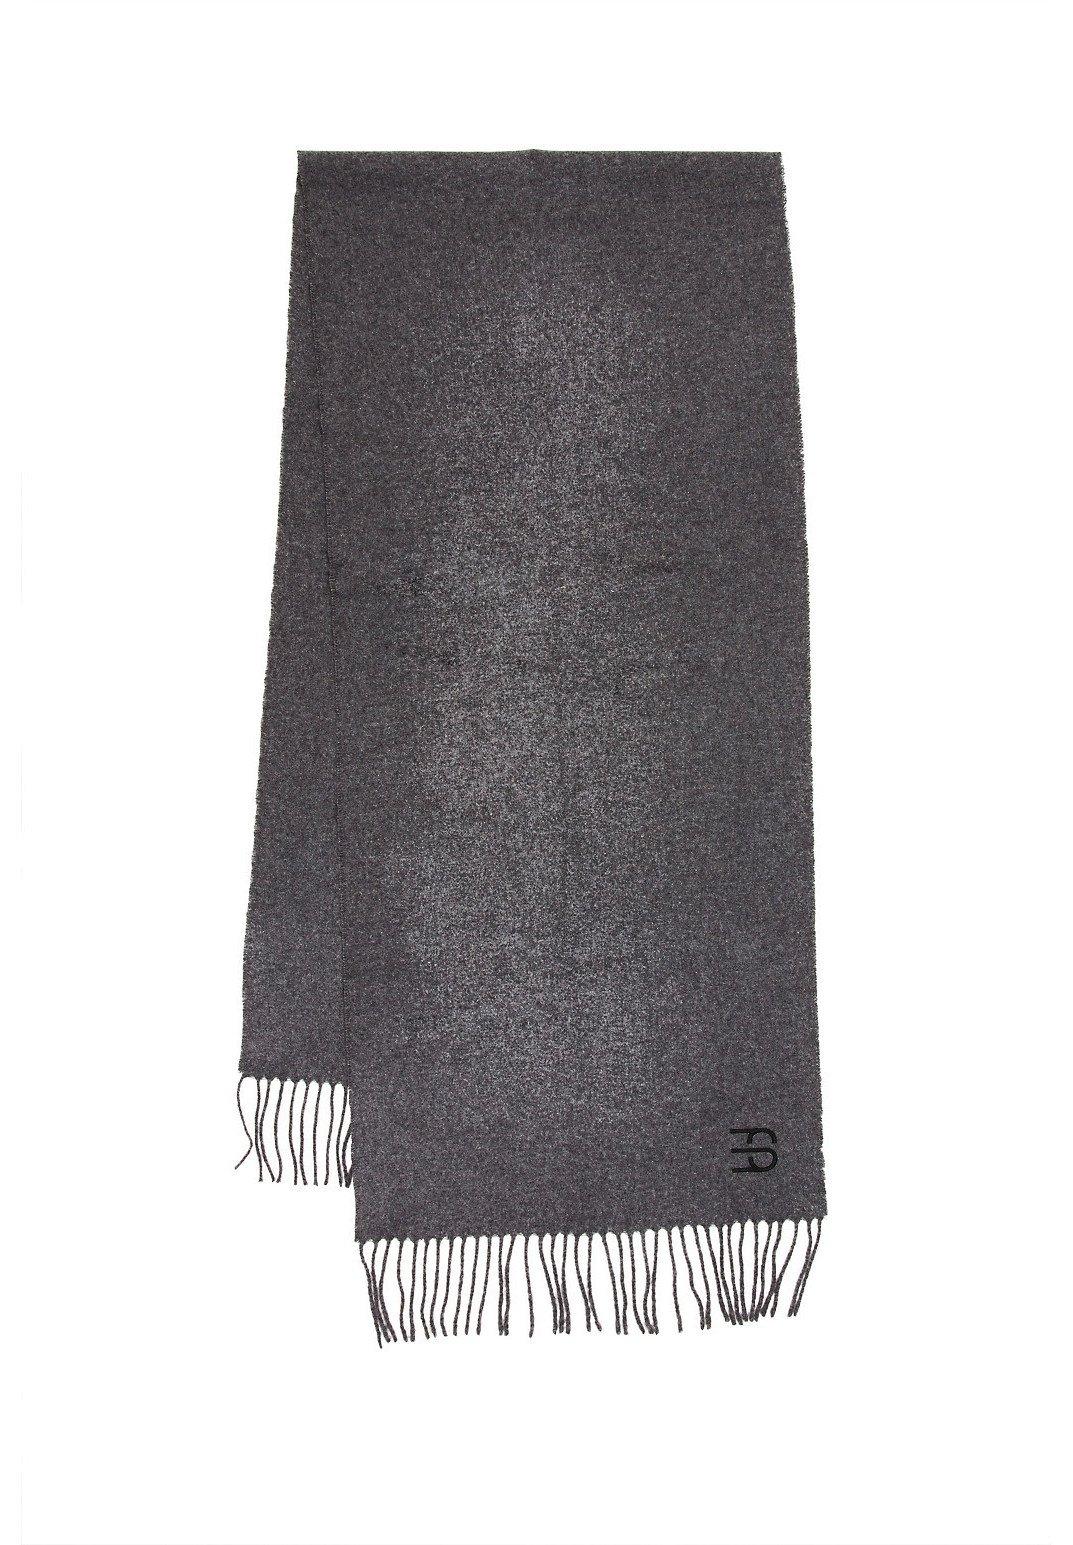 Esprit Schal - dark grey/dunkelgrau - Herrenaccessoires pzhS8